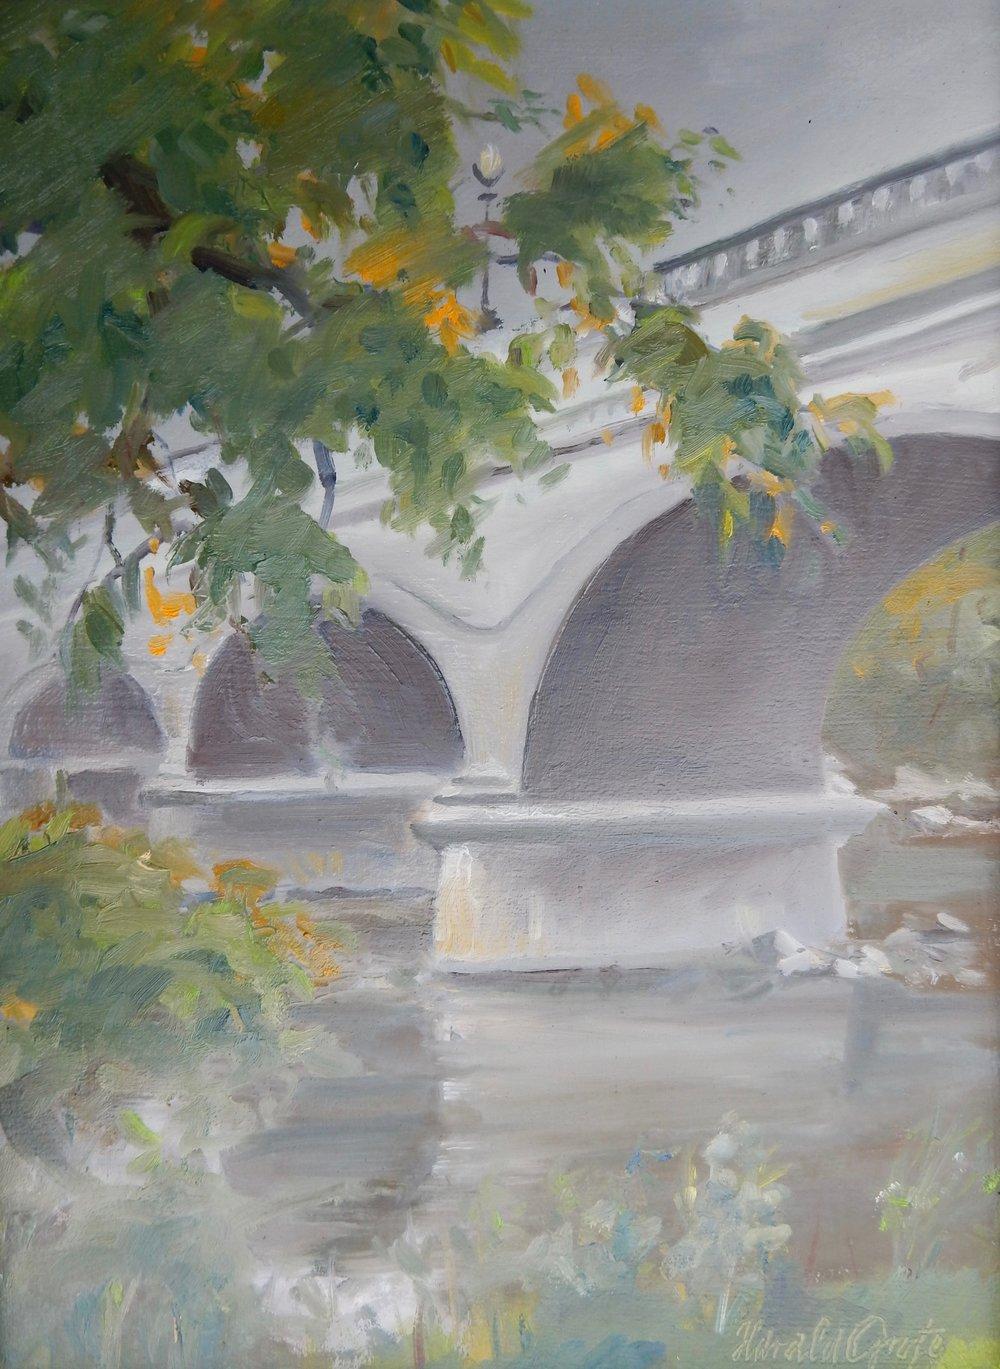 Grote DSCN6591 12x16 Washington Street Bridge 1.jpg